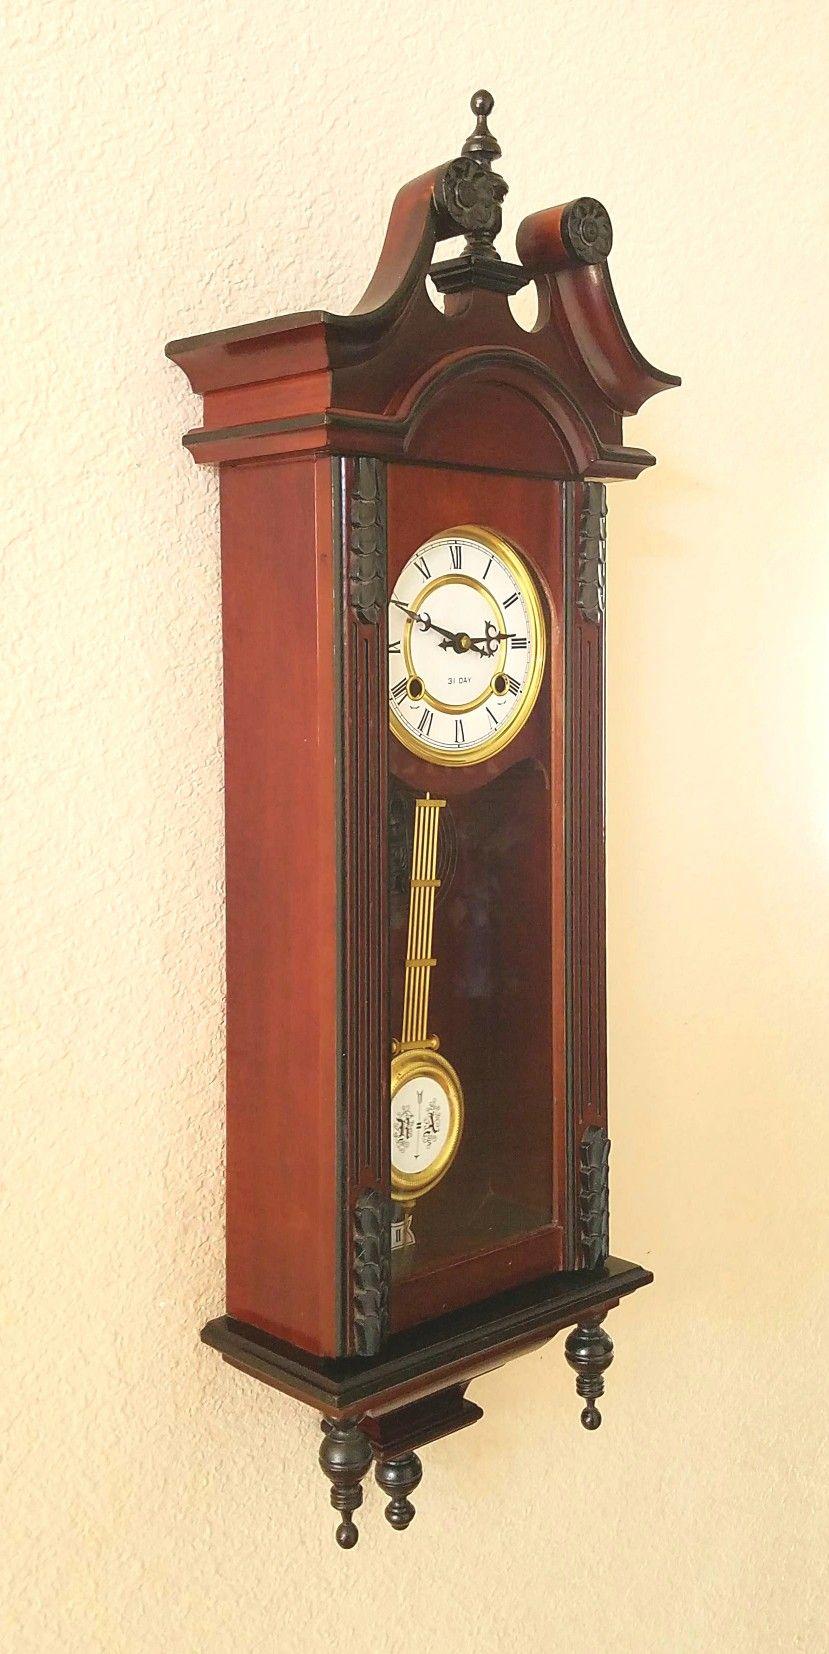 Vienna Regulator Style Chiming Pendulum Wall Clock With Professionally Restored 31 Day Clockwork Thecloc Pendulum Wall Clock Antique Wall Clock Antique Clocks